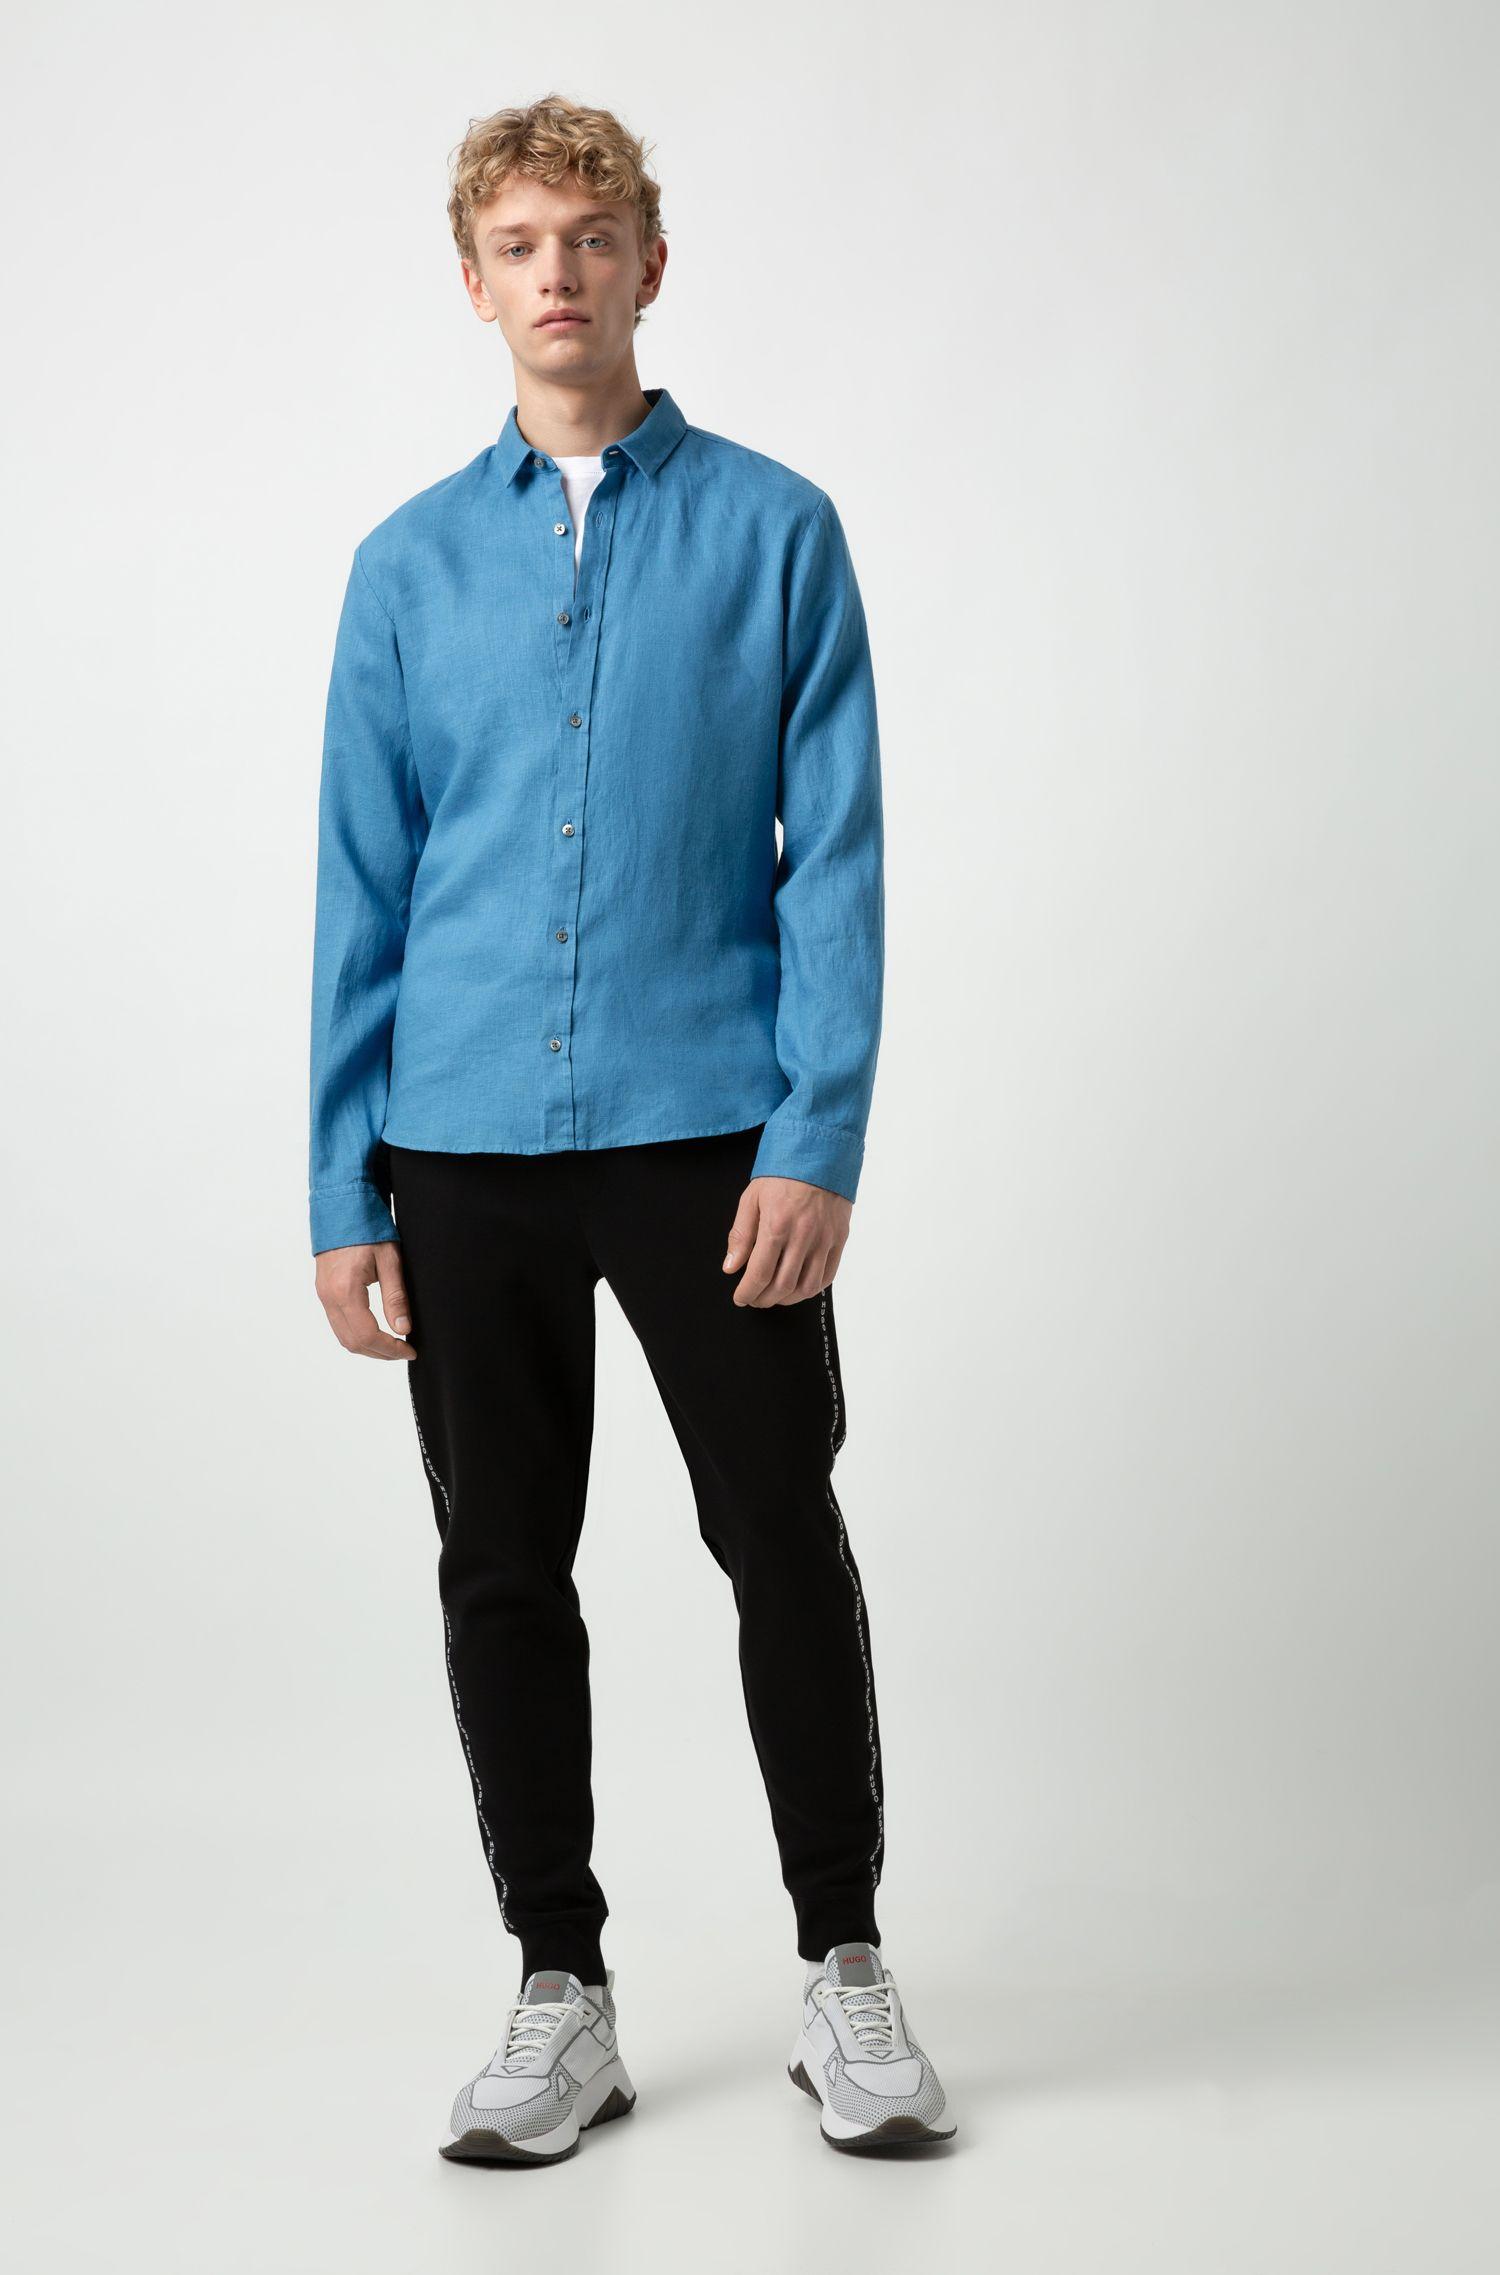 Cuffed-hem interlock-cotton pants with logo-tape side seams, Black